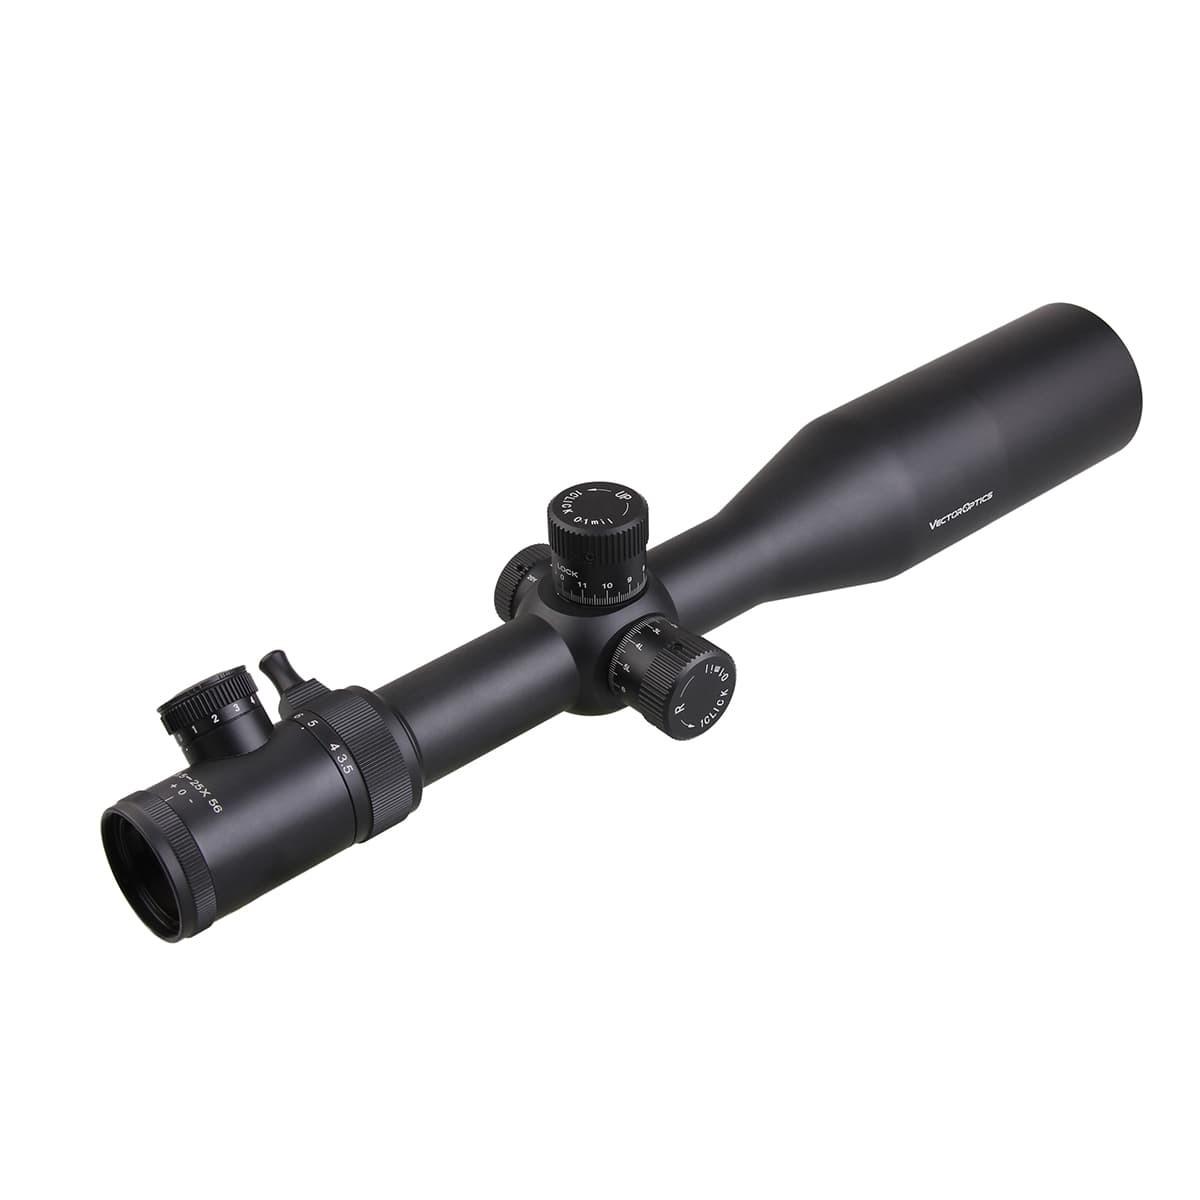 Reiter 3.5-25x56SFP Riflescope